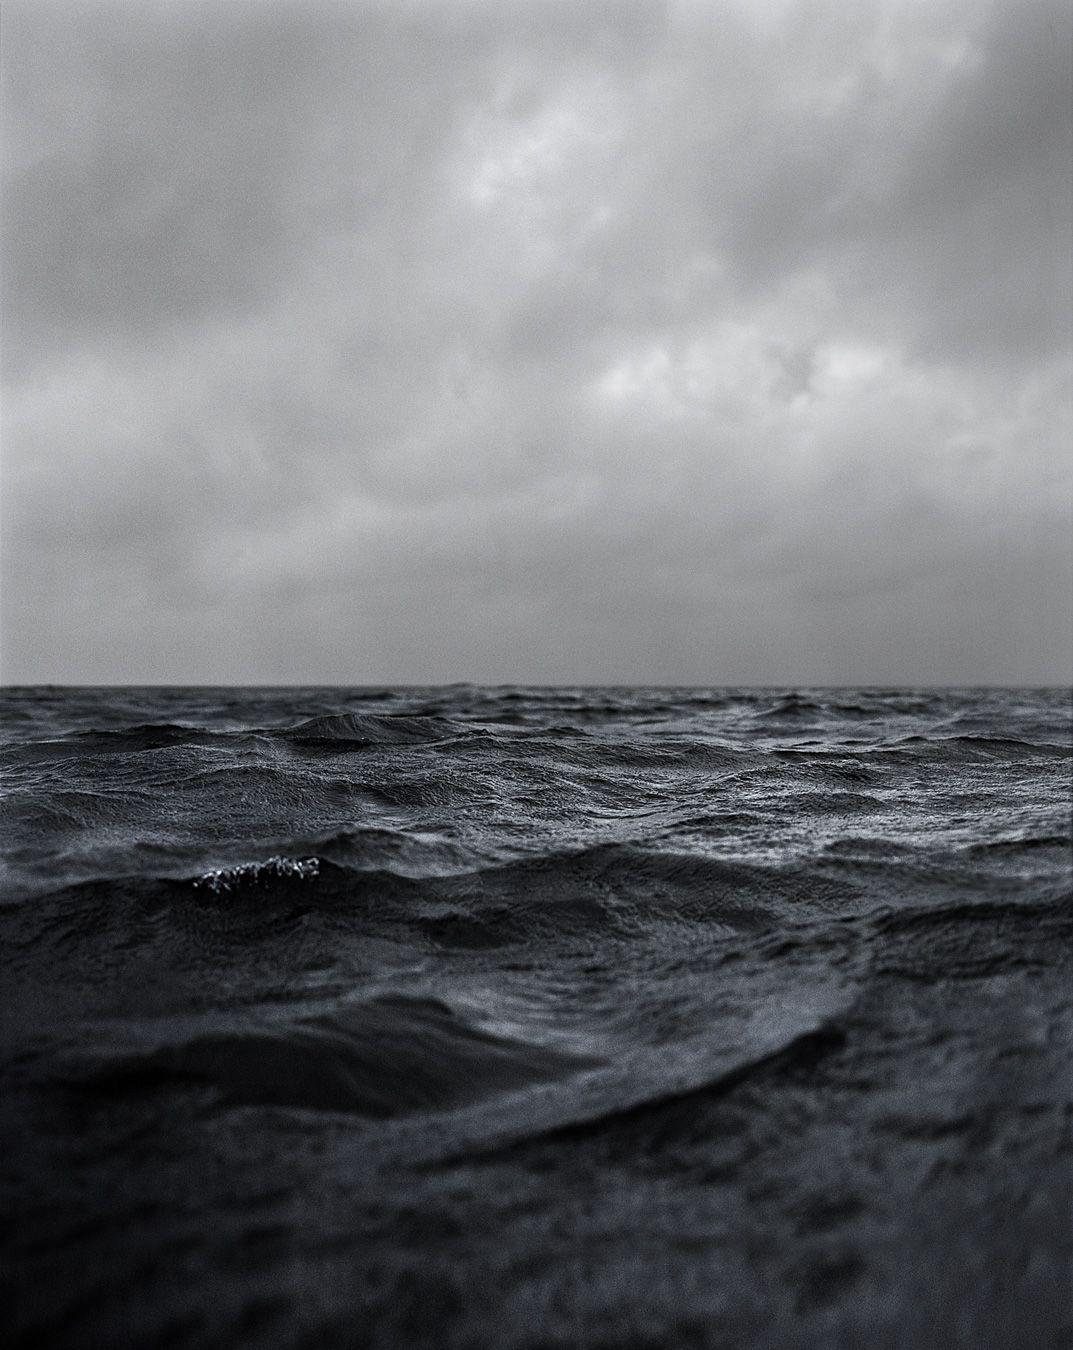 Blaise Hayward - New York Photographer   LANDSCAPE   15